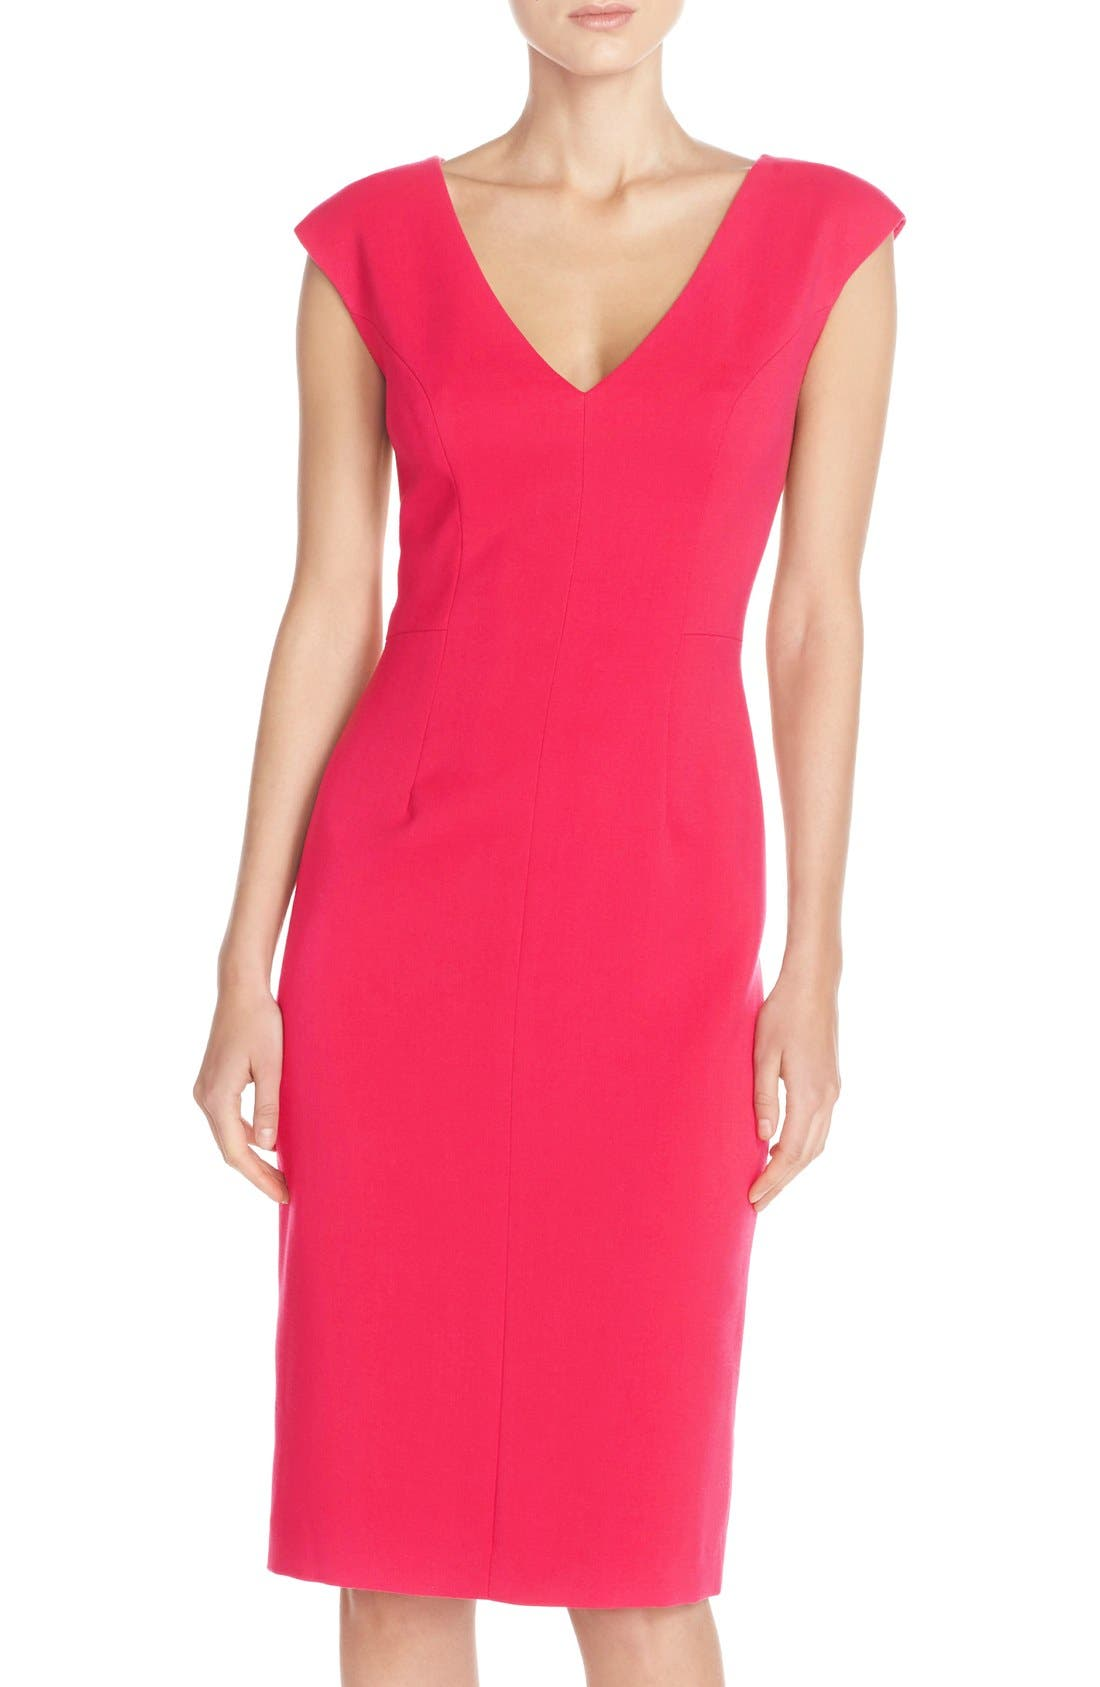 Alternate Image 1 Selected - Eliza J Crepe Sheath Dress (Regular & Petite)